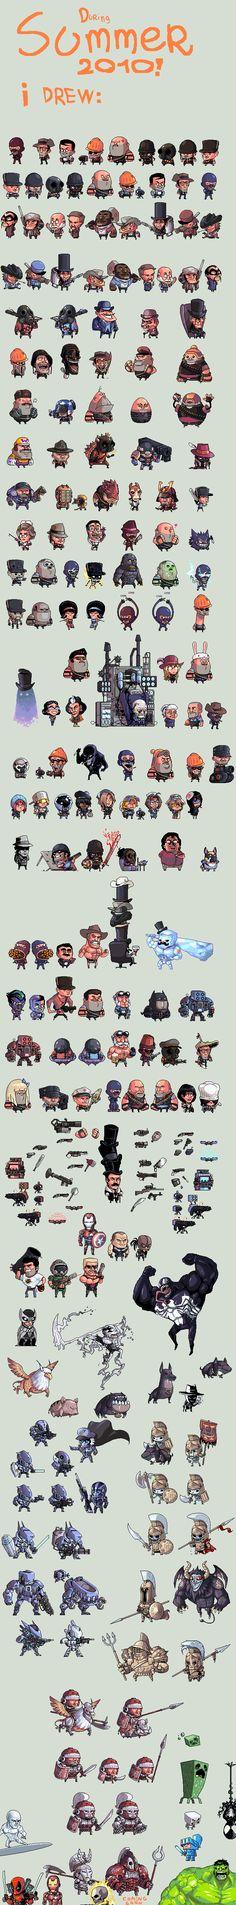 Productive Summer pixel art by Shwig - Team Fortress 2, Mass Effect, Venom, Minecraft, Avengers...